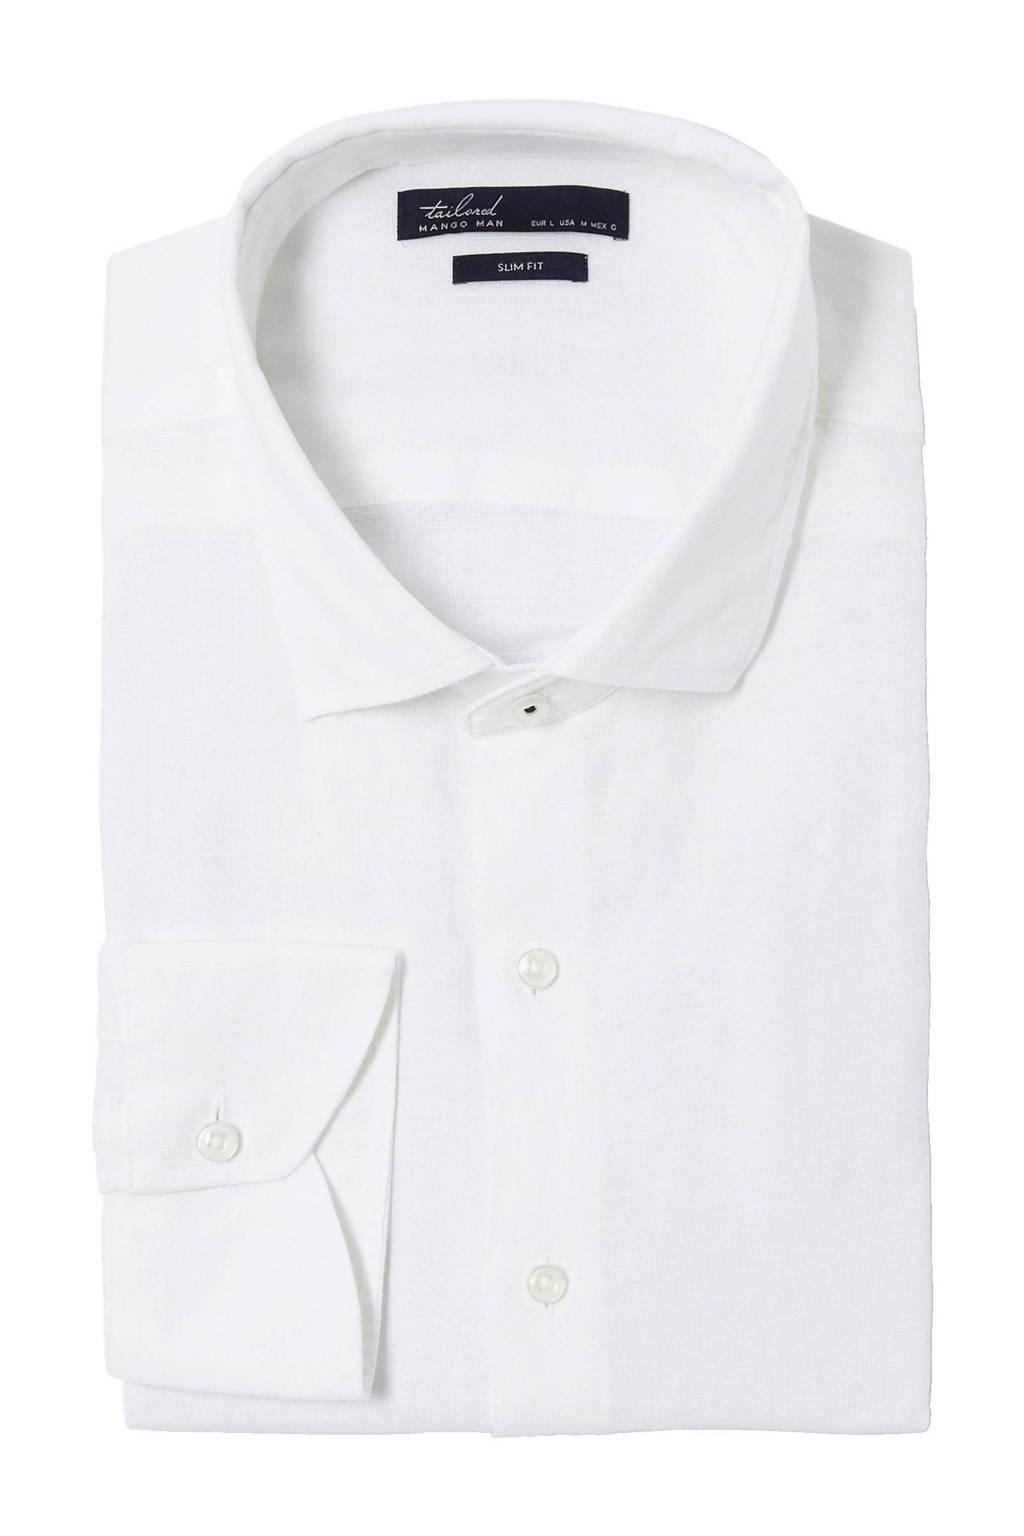 Linnen Overhemd Wit.Mango Man Slim Fit Linnen Overhemd Wit Wehkamp